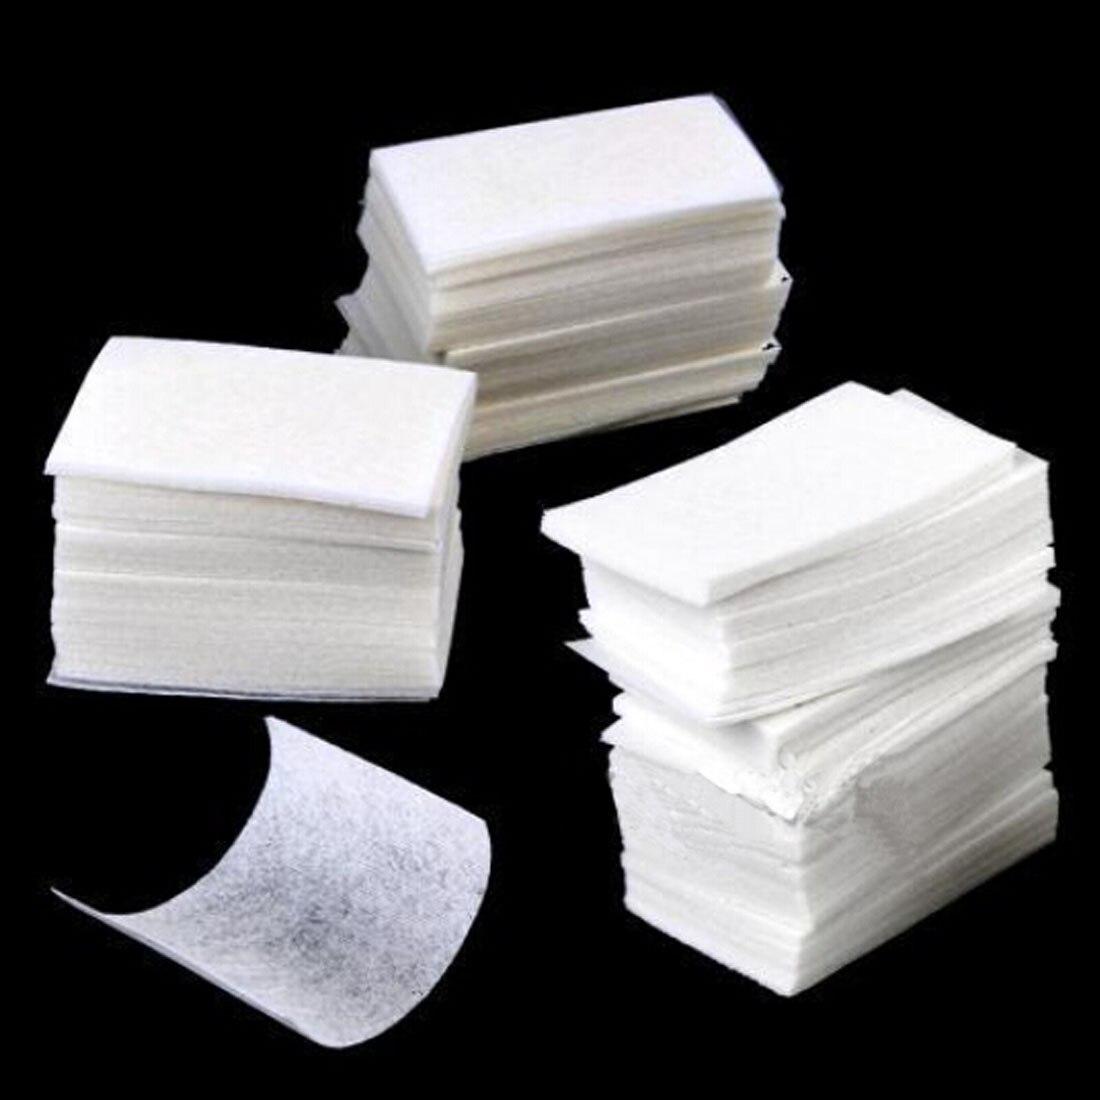 380pcs/set Women Nail Art Remover Manicure Polish Gel Wipes Cotton Lint Cotton Pads Paper Acrylic Gel Tips